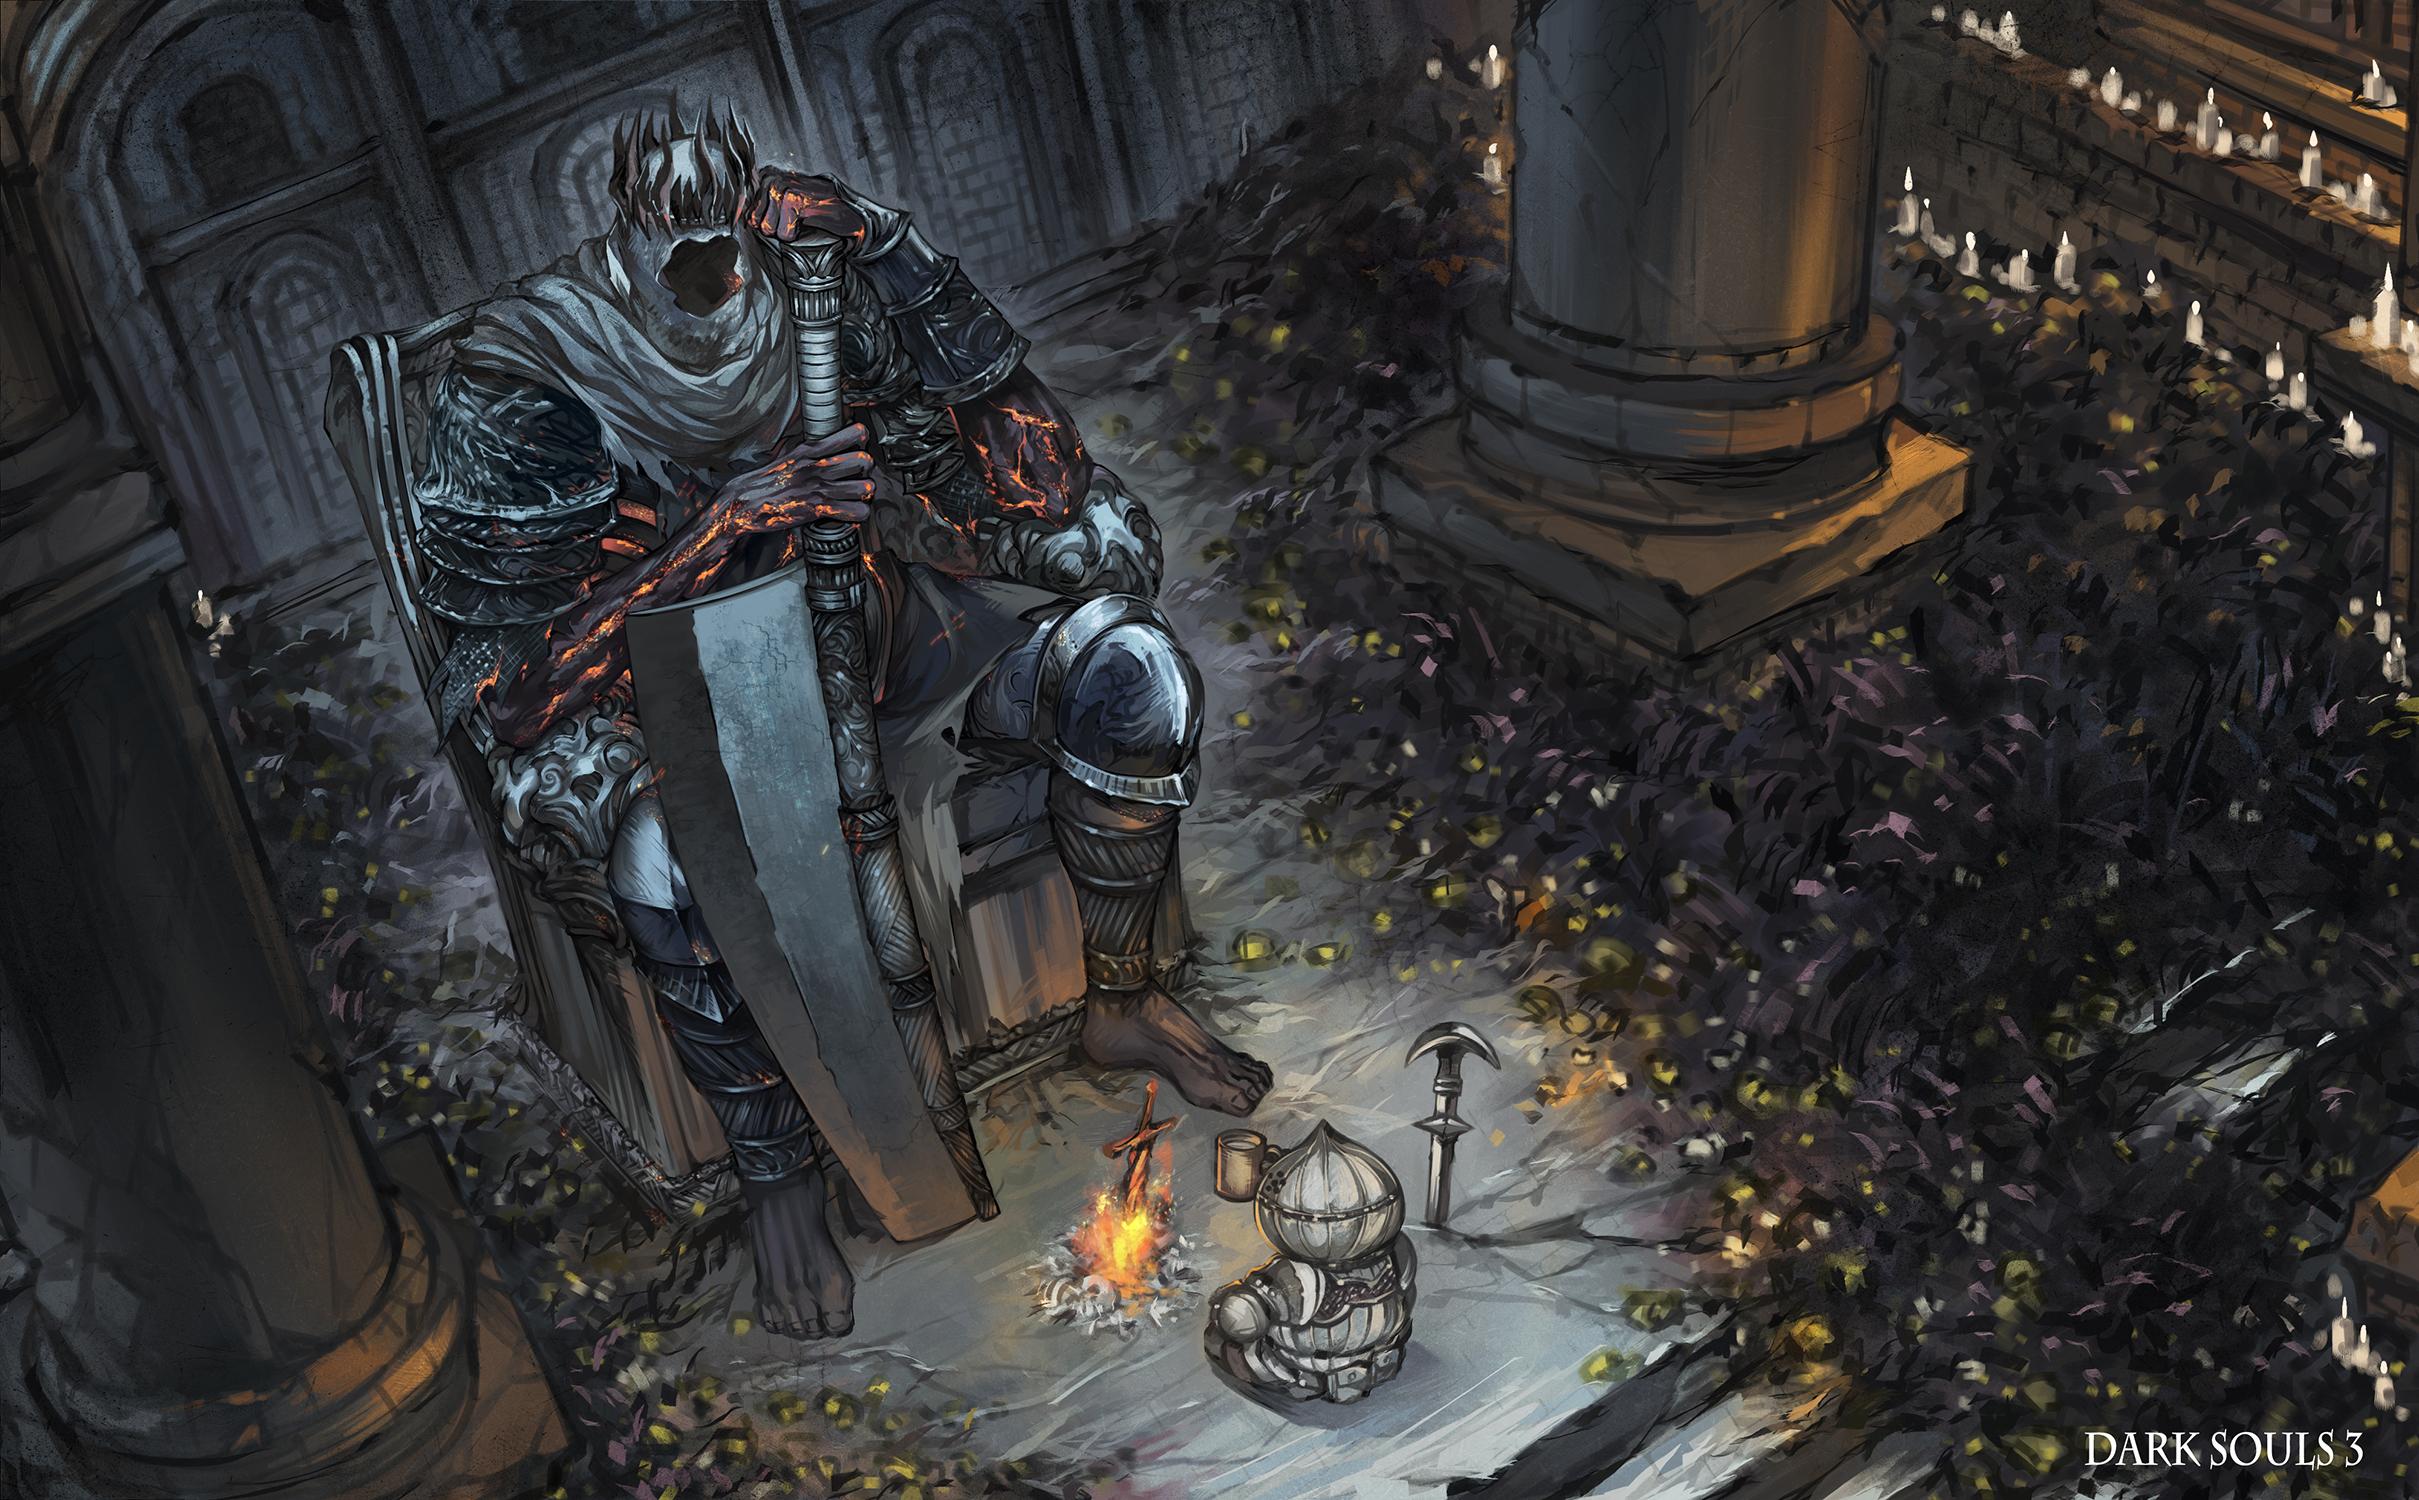 Dark Souls 3 Hd Wallpaper Posted By John Thompson